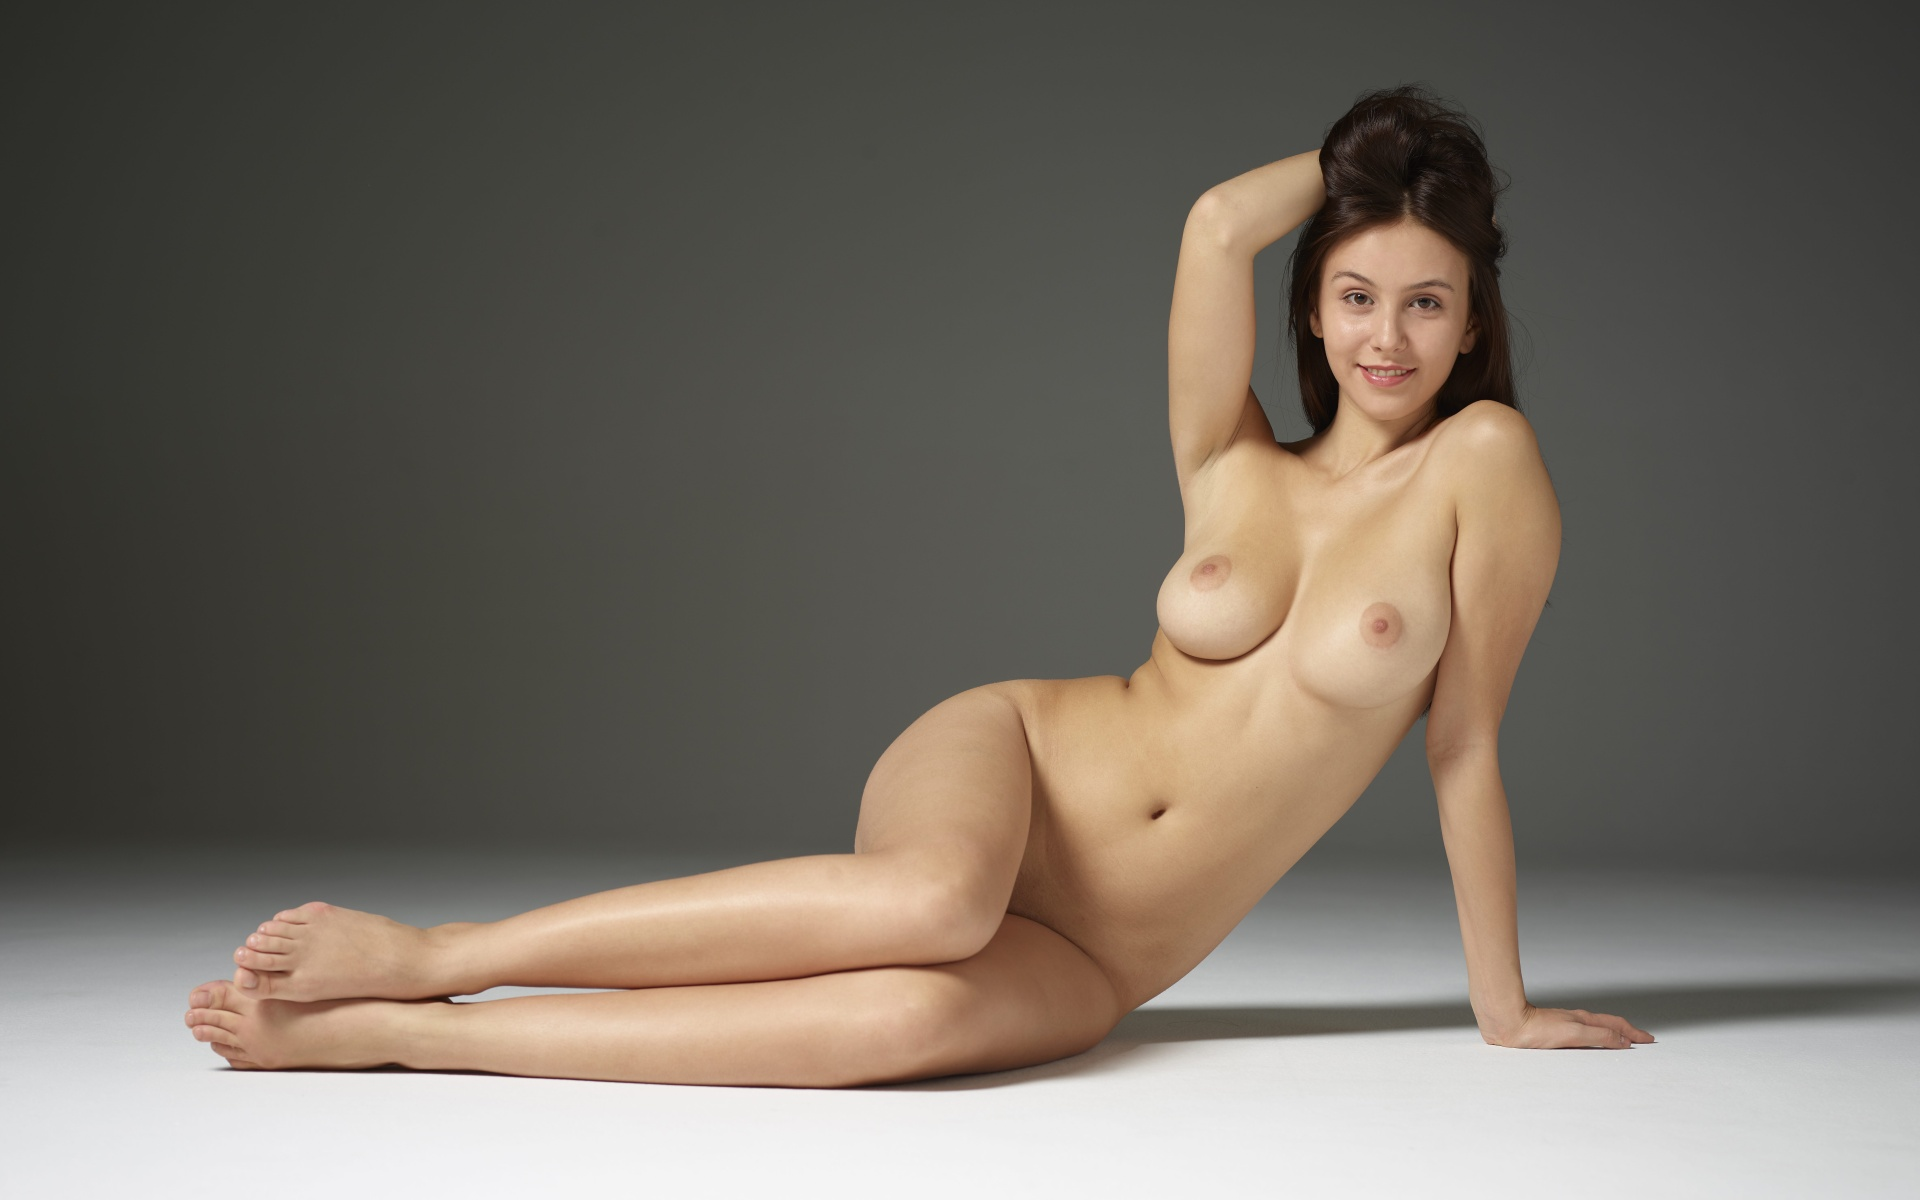 Big brother girls nude